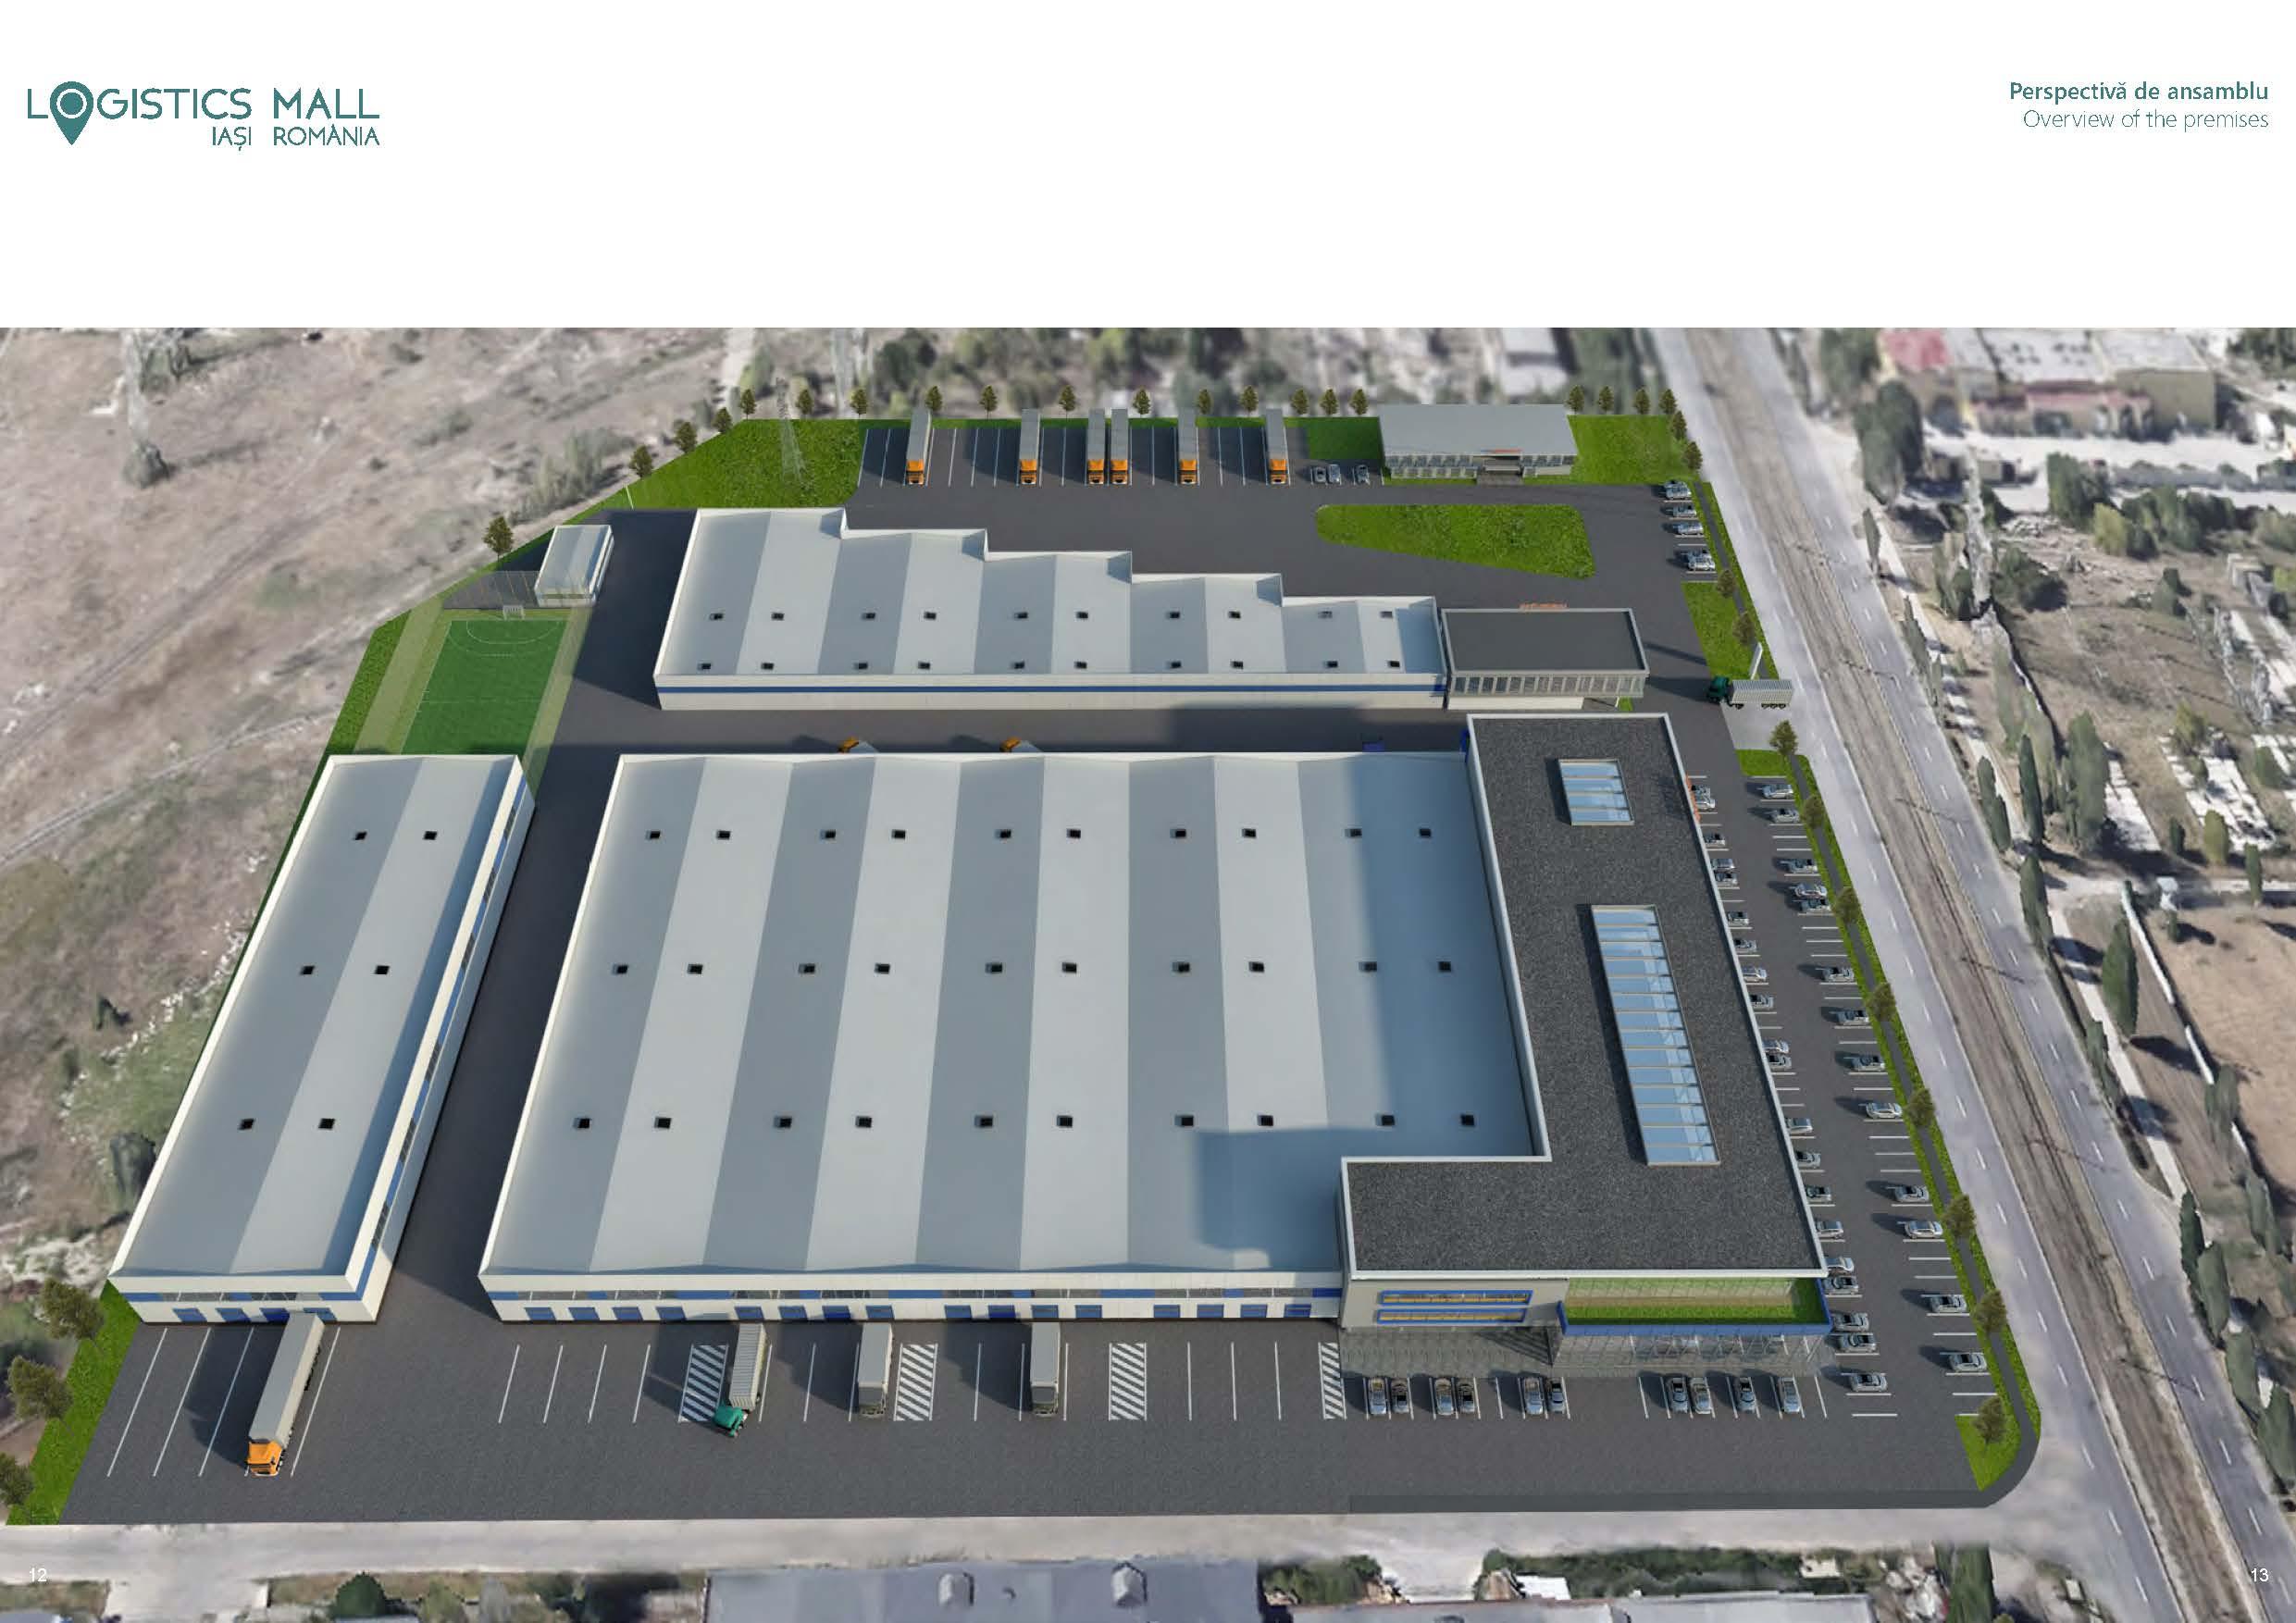 26n-vizualizare-brosura-logistics-mall-iasi_page_08